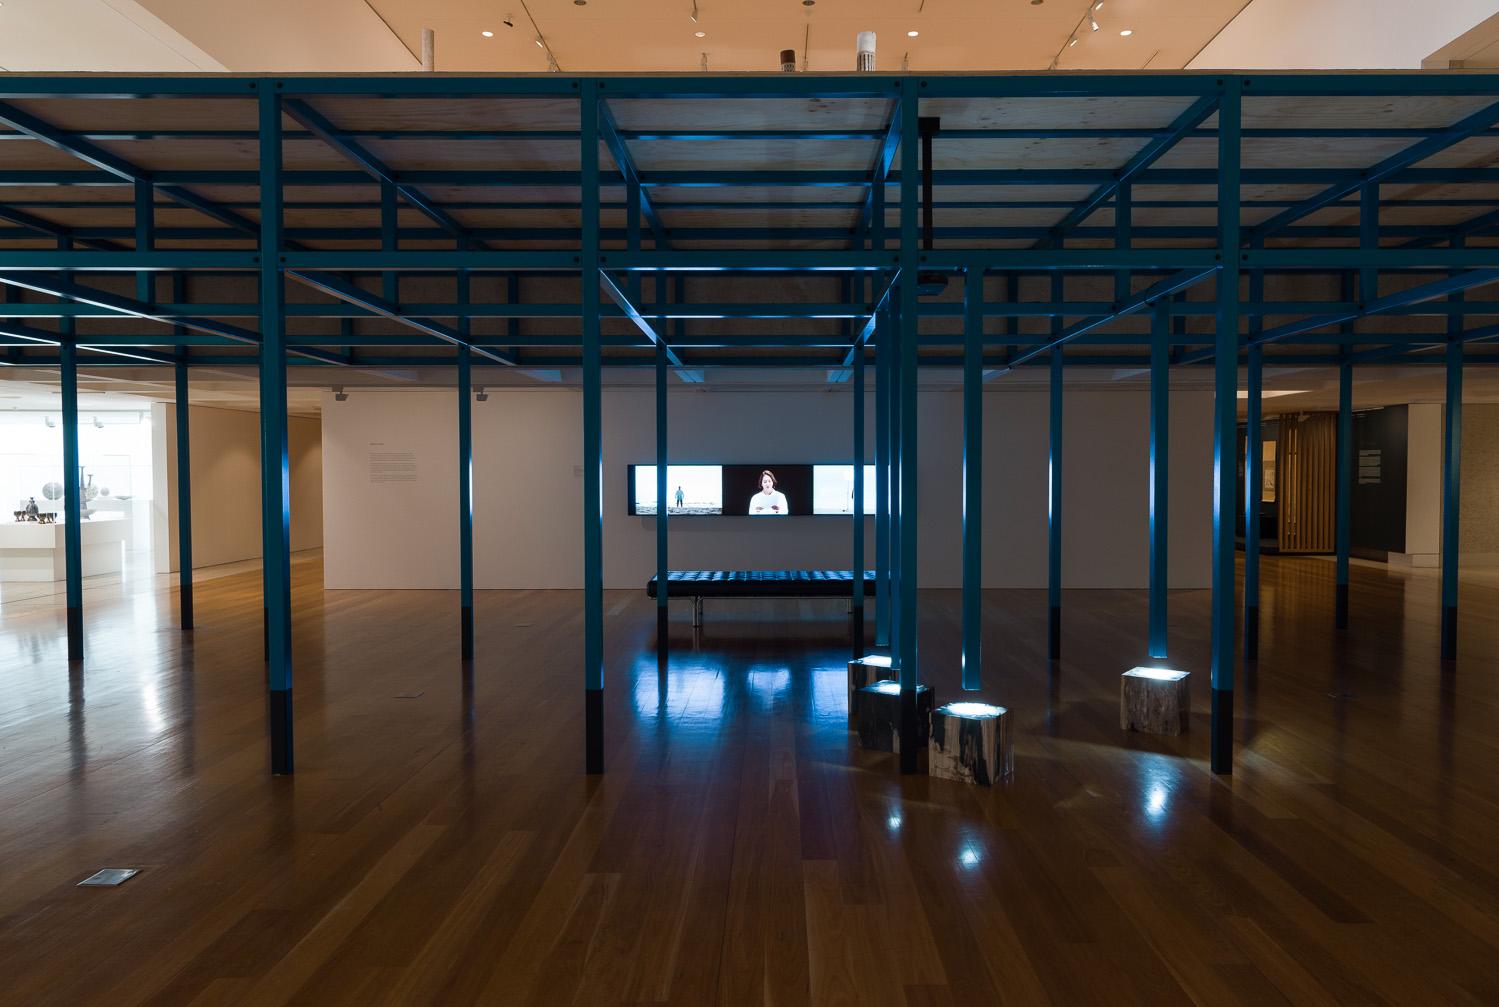 Boedi Widjaja, 'Black—Hut, Black—Hut', 2018–19, installation view at Queensland Art Gallery | Gallery of Modern Art. Photograph by Natasha Harth. Image courtesy of the artist.